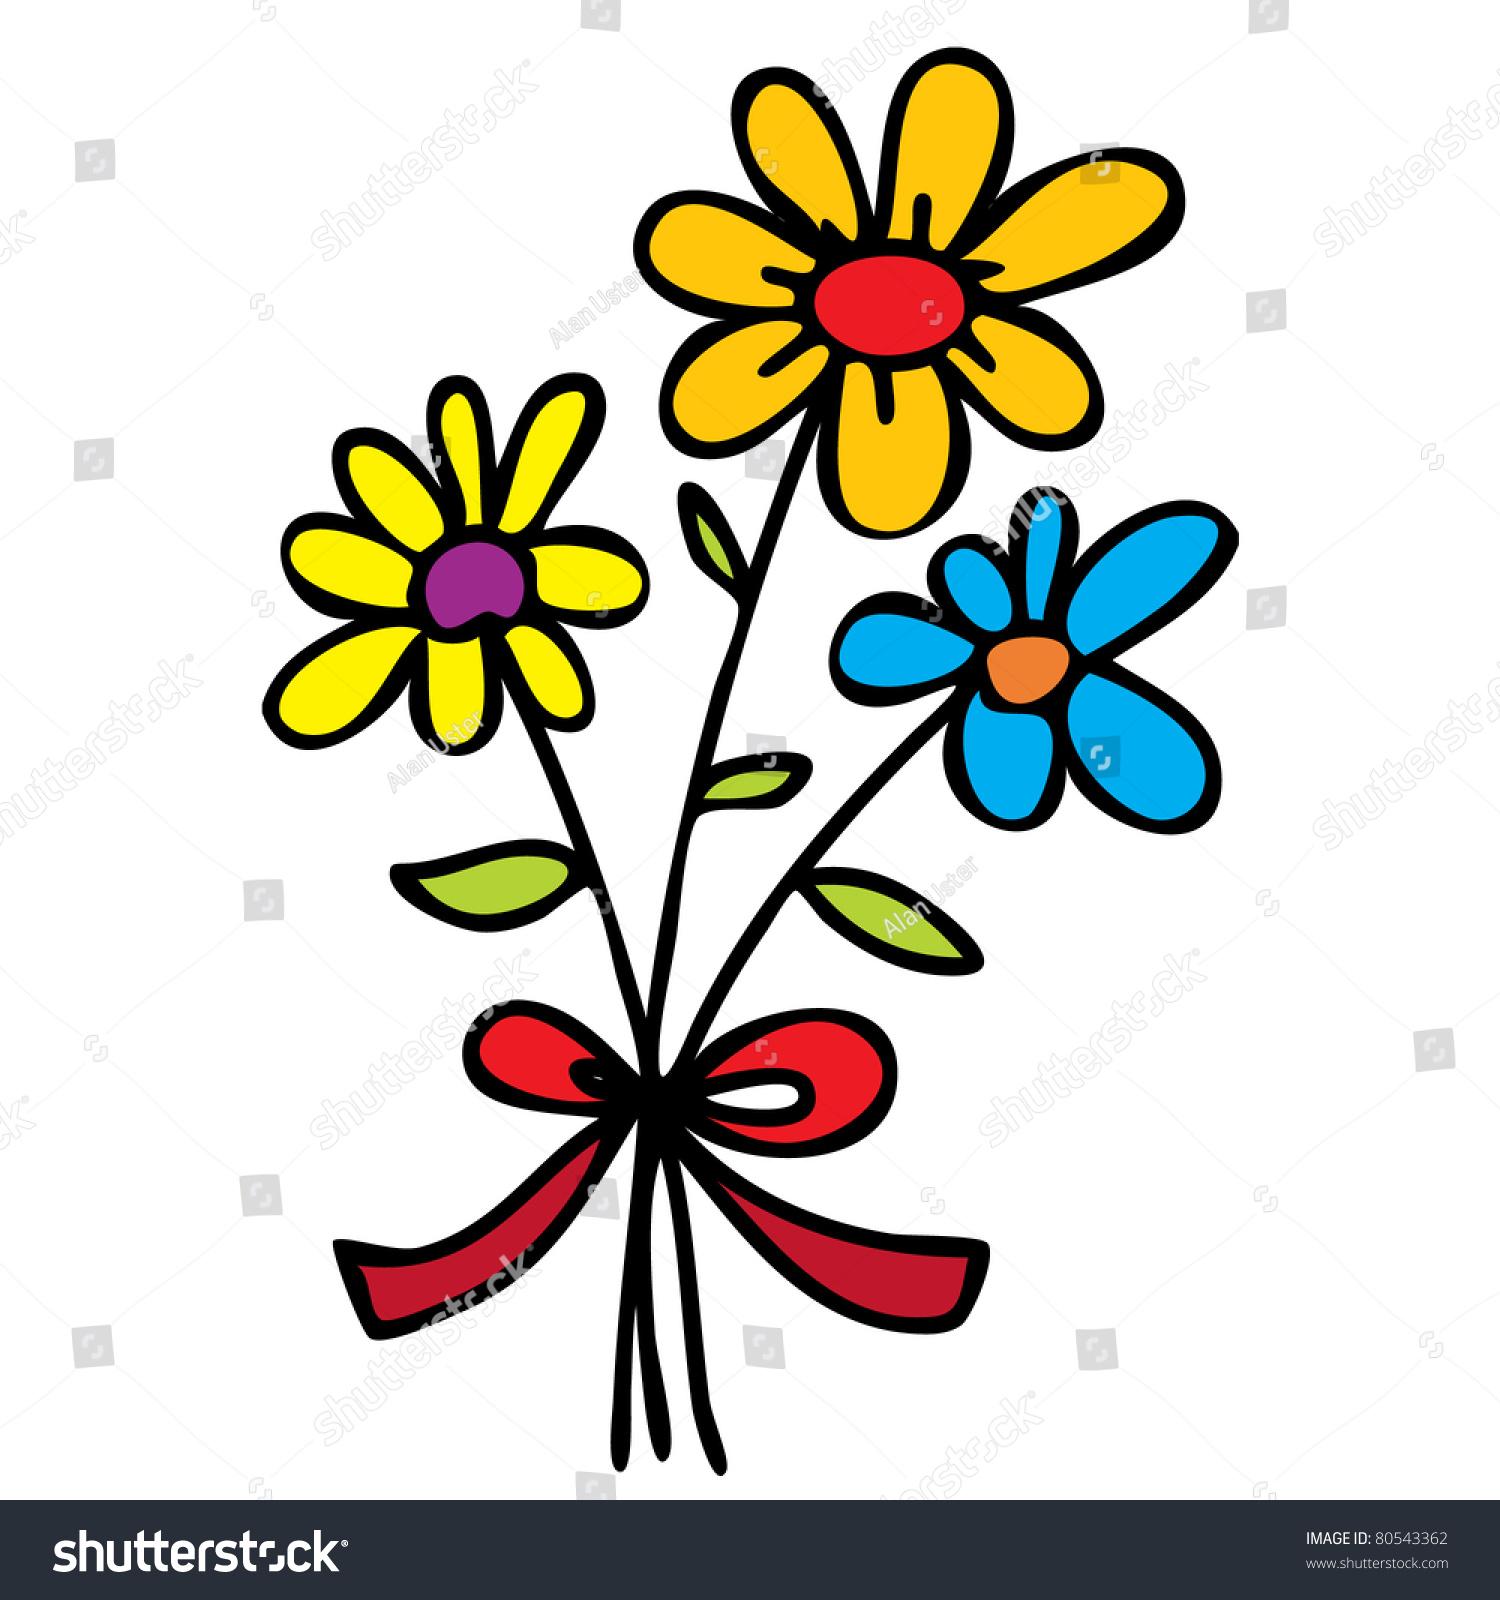 Cartoon Flowers Images cartoon flowers stock photos, images ...